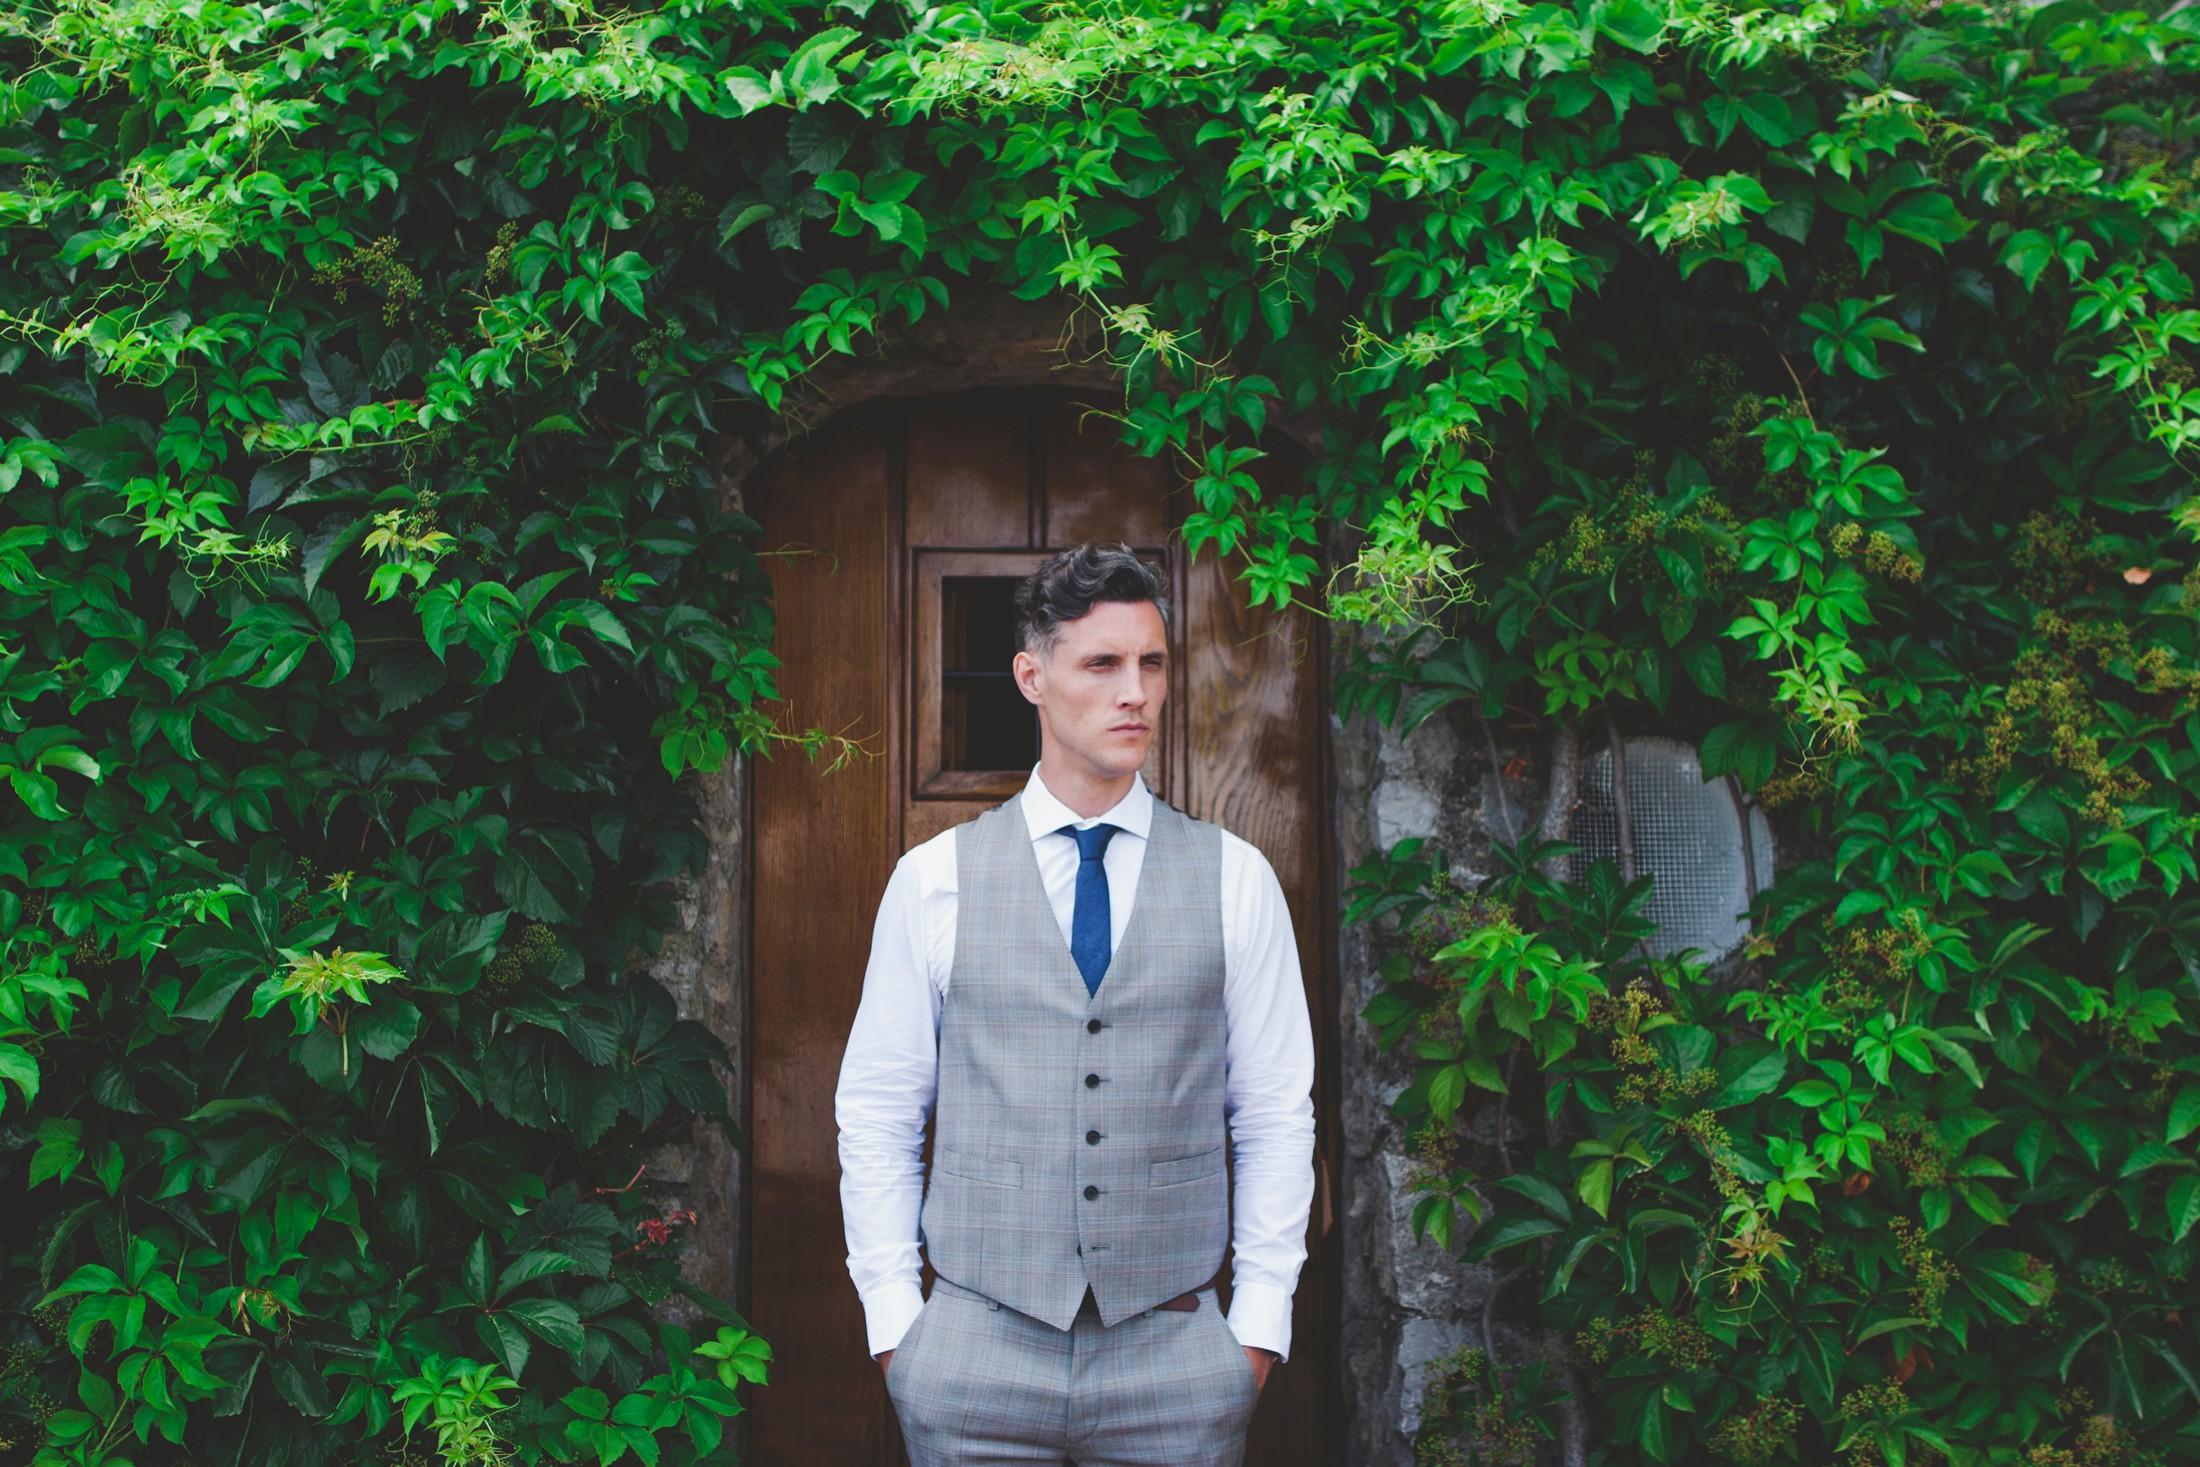 ravello wedding groom's portrait with a wooden door as backdrop